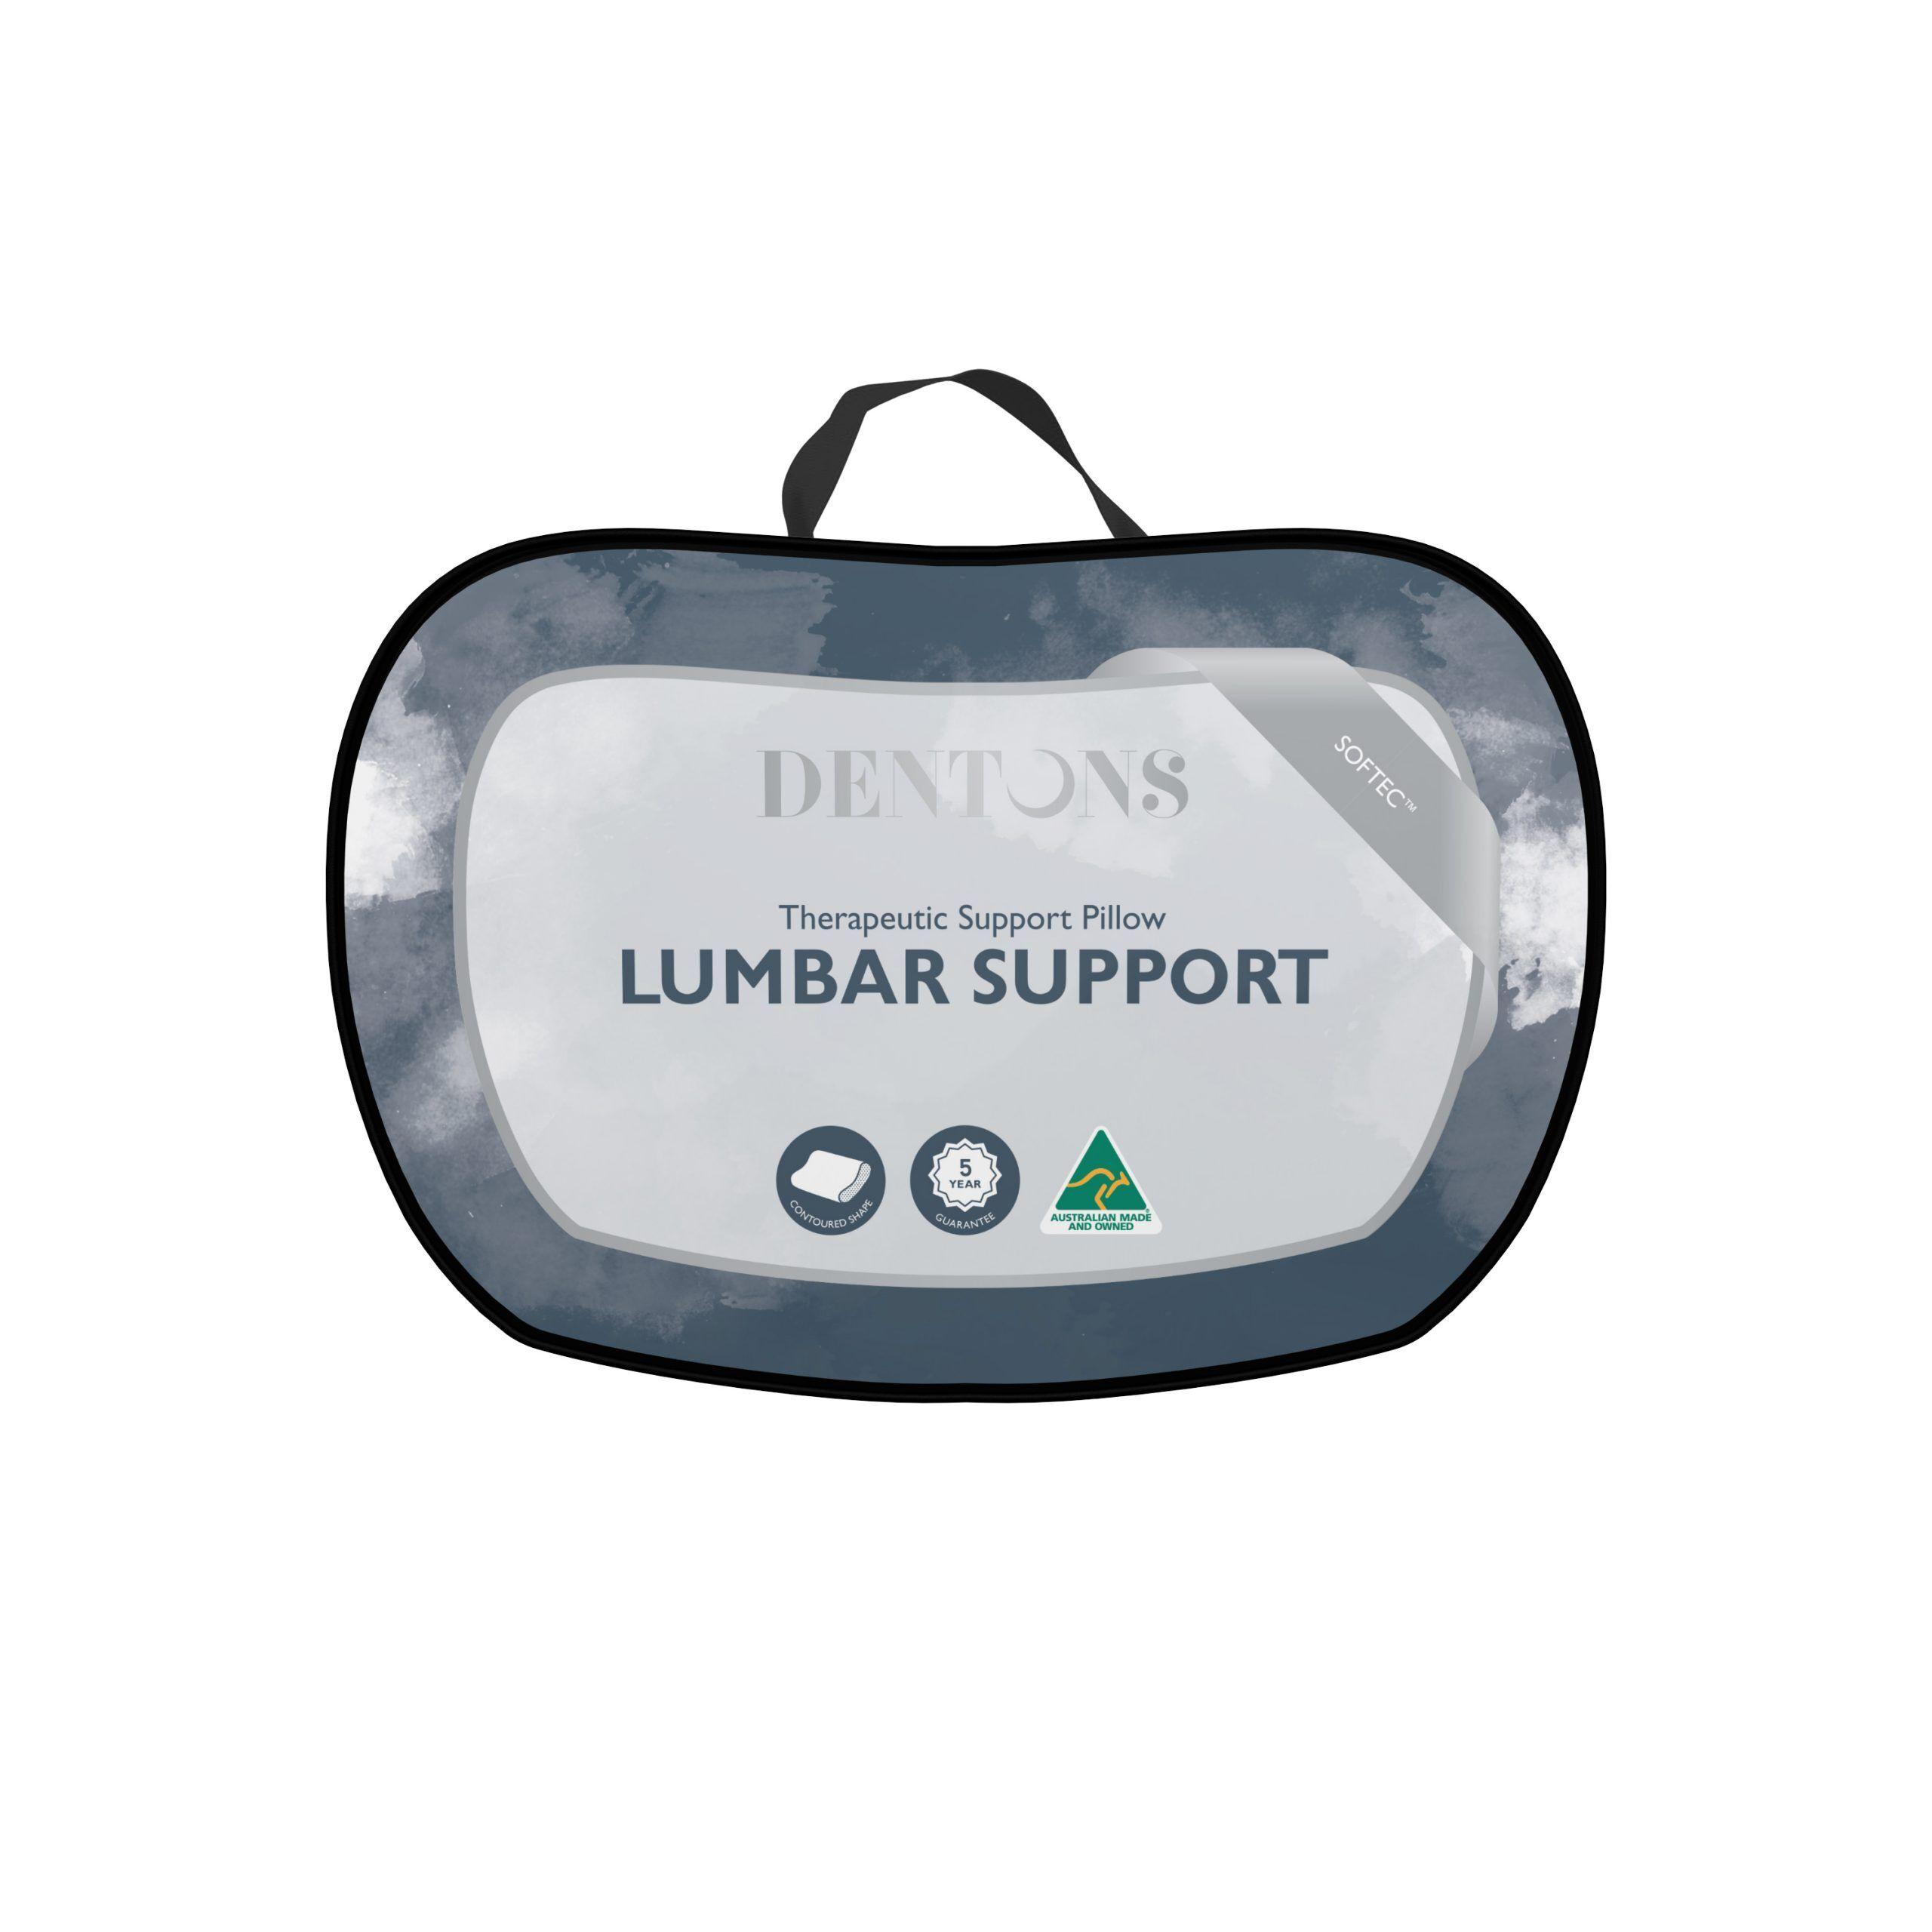 Dentons Lumbar Support Pillow